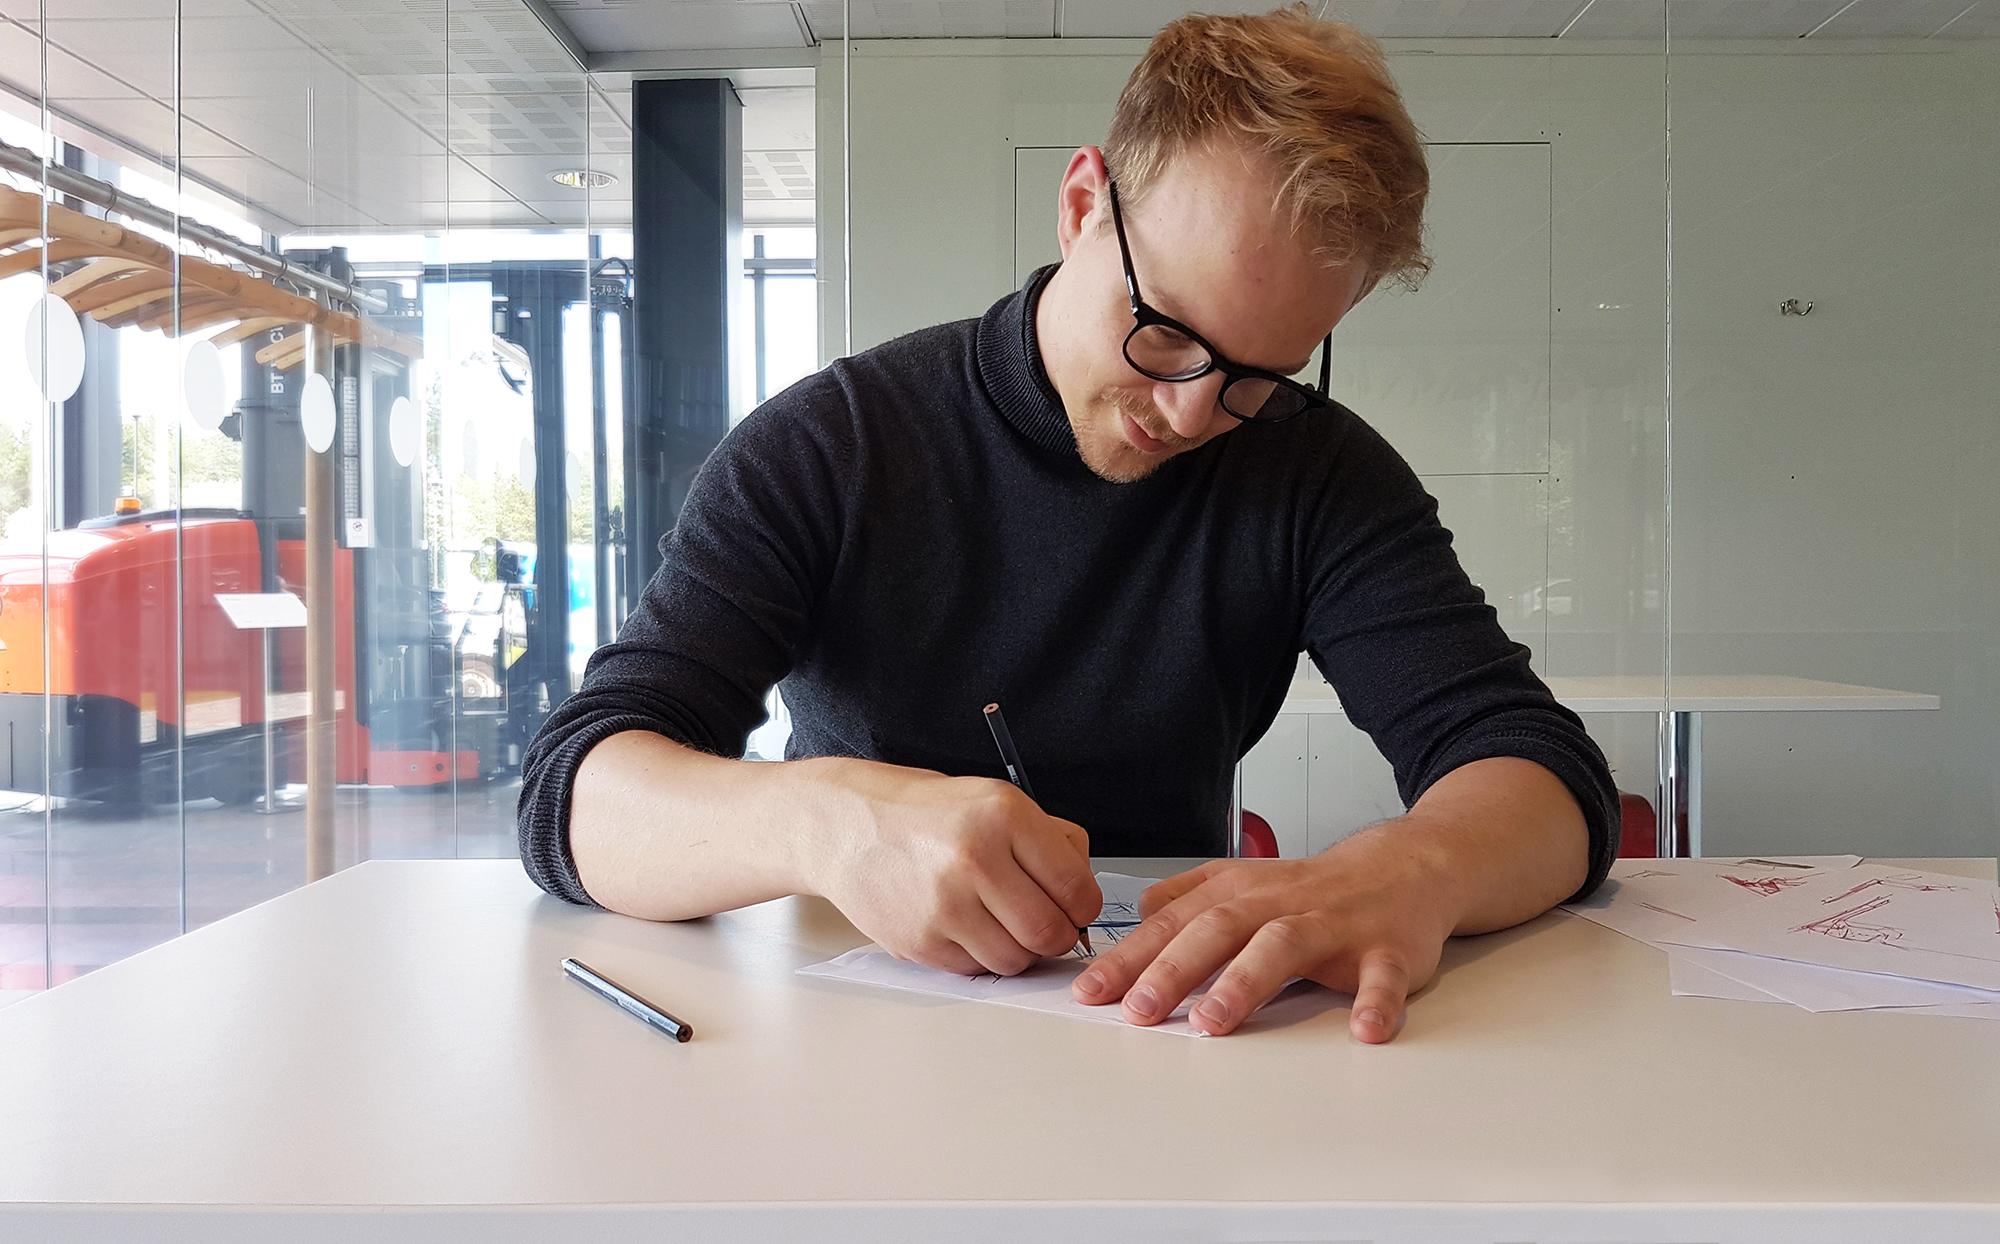 Viljami Räisänen studio image